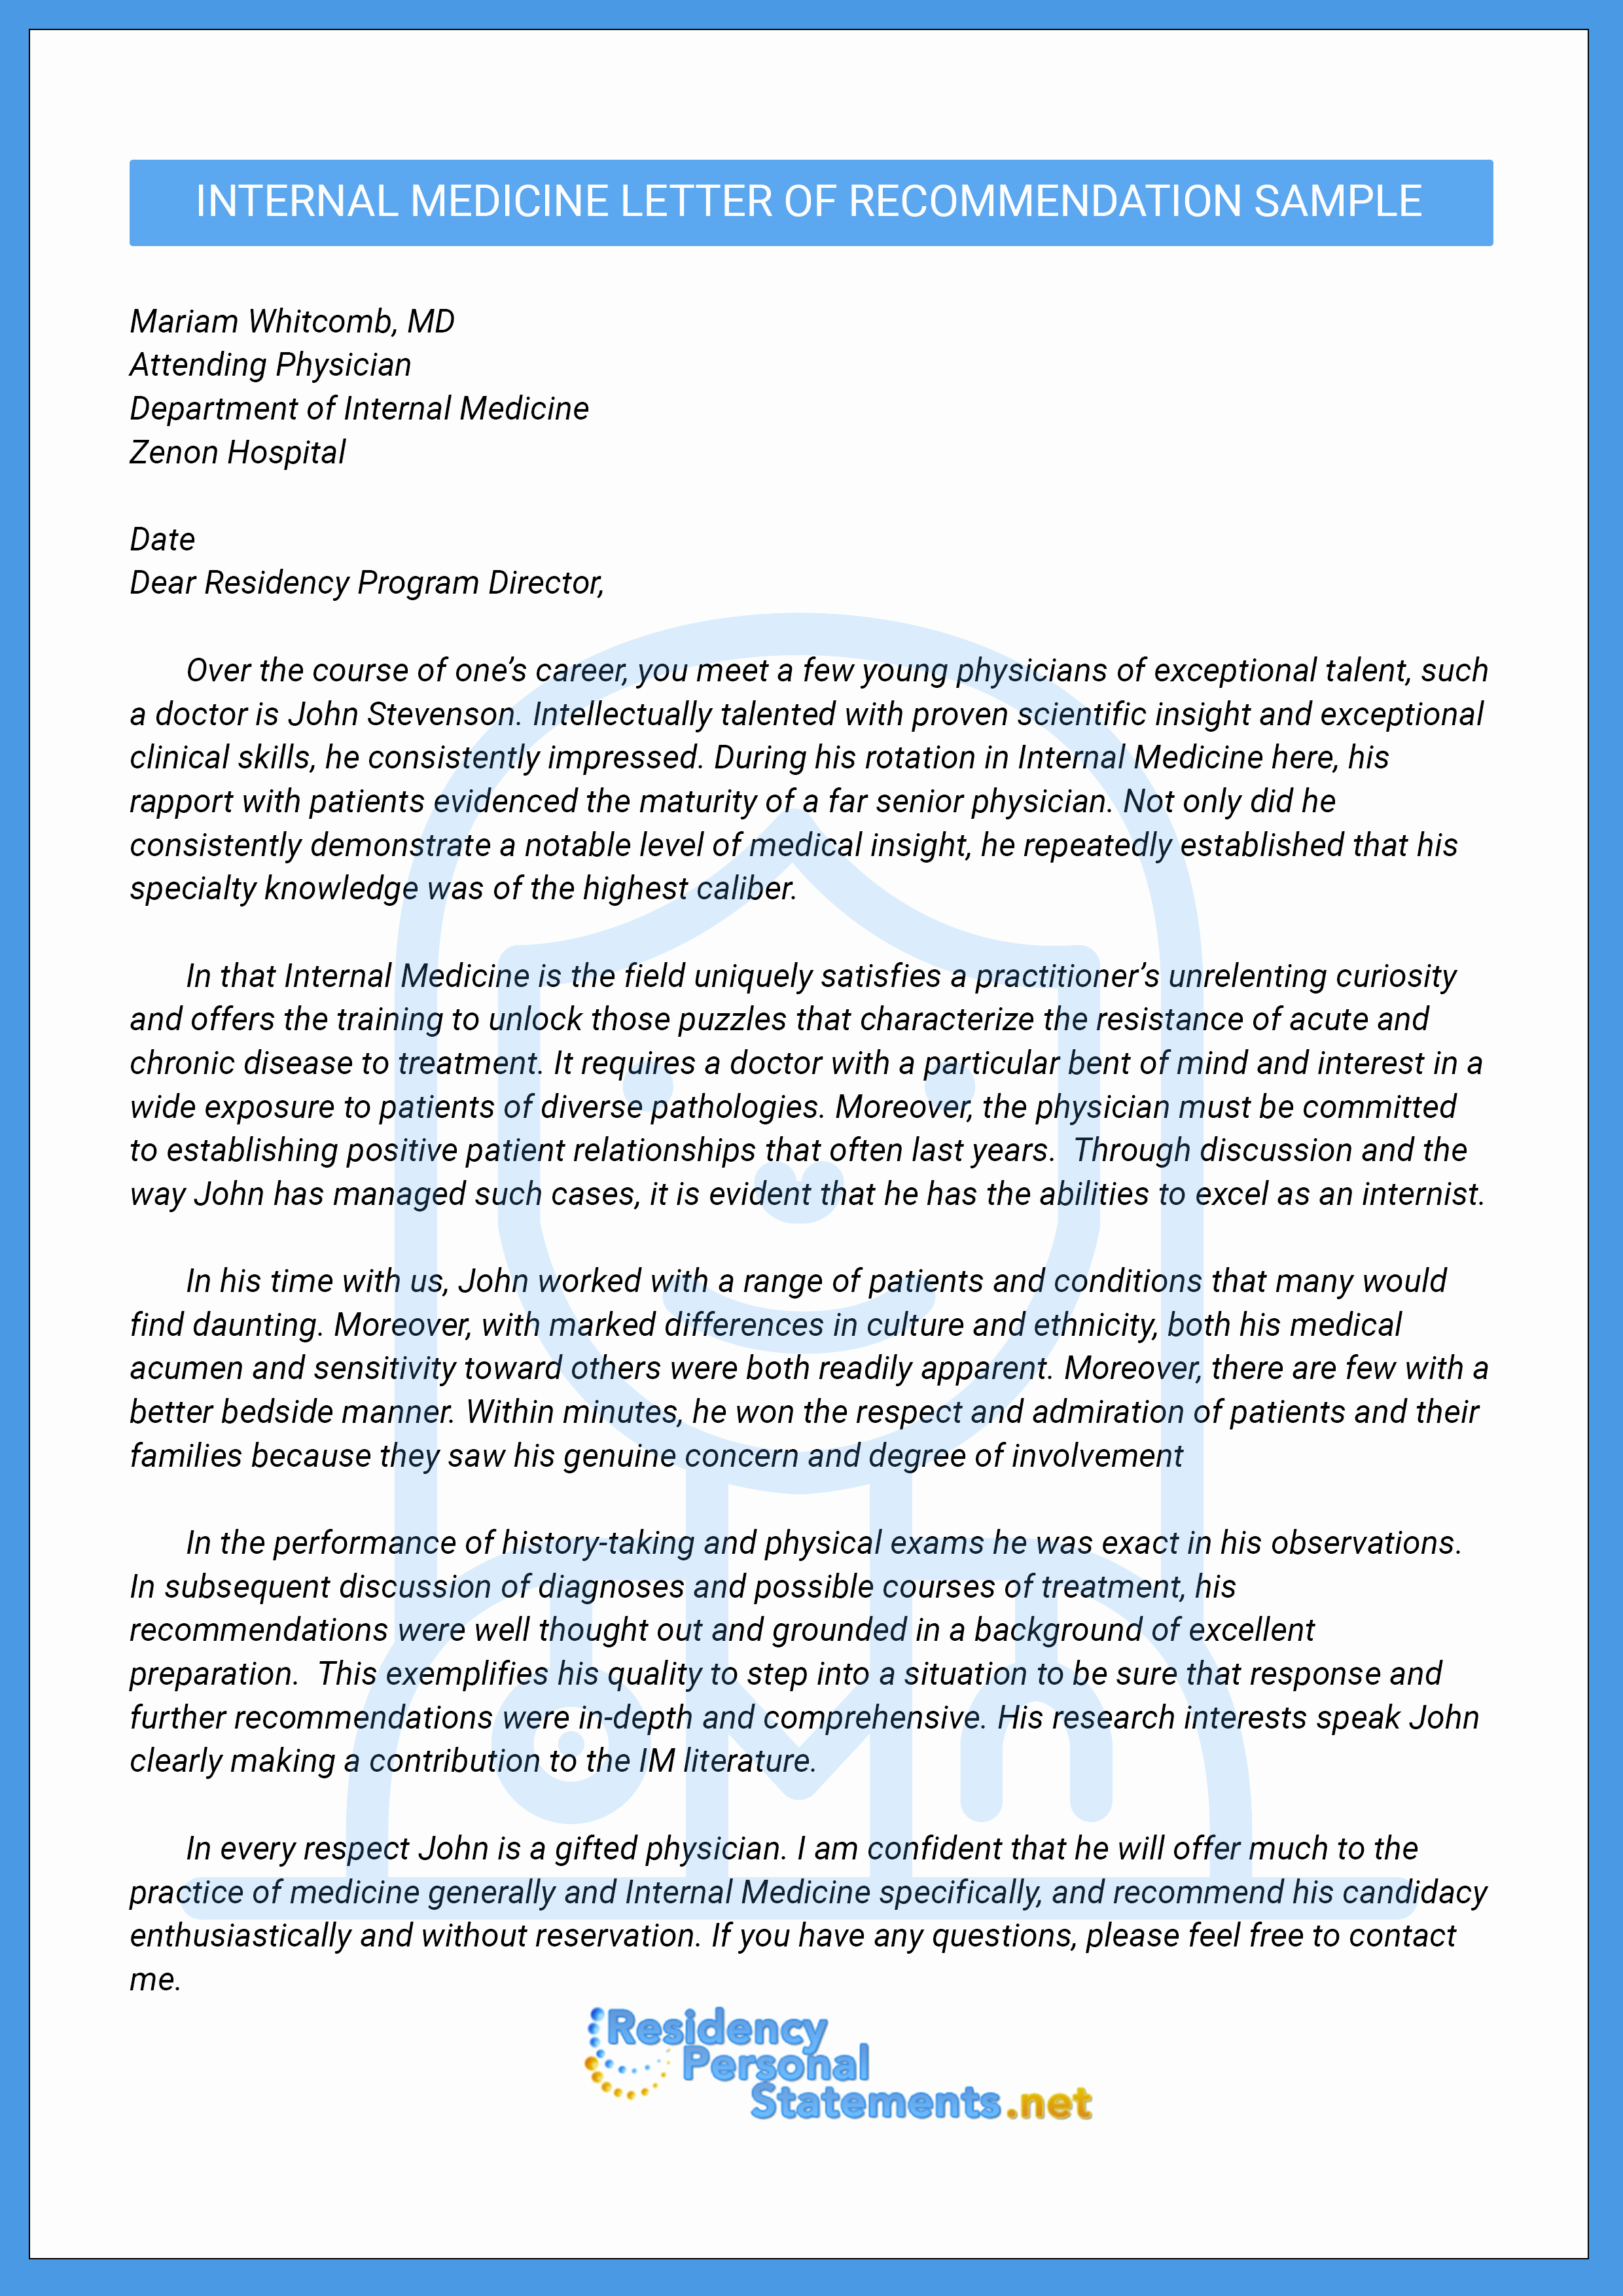 Recommendation Letter for Fellowship New Letter Of Re Mendation for Internal Medicine Residency